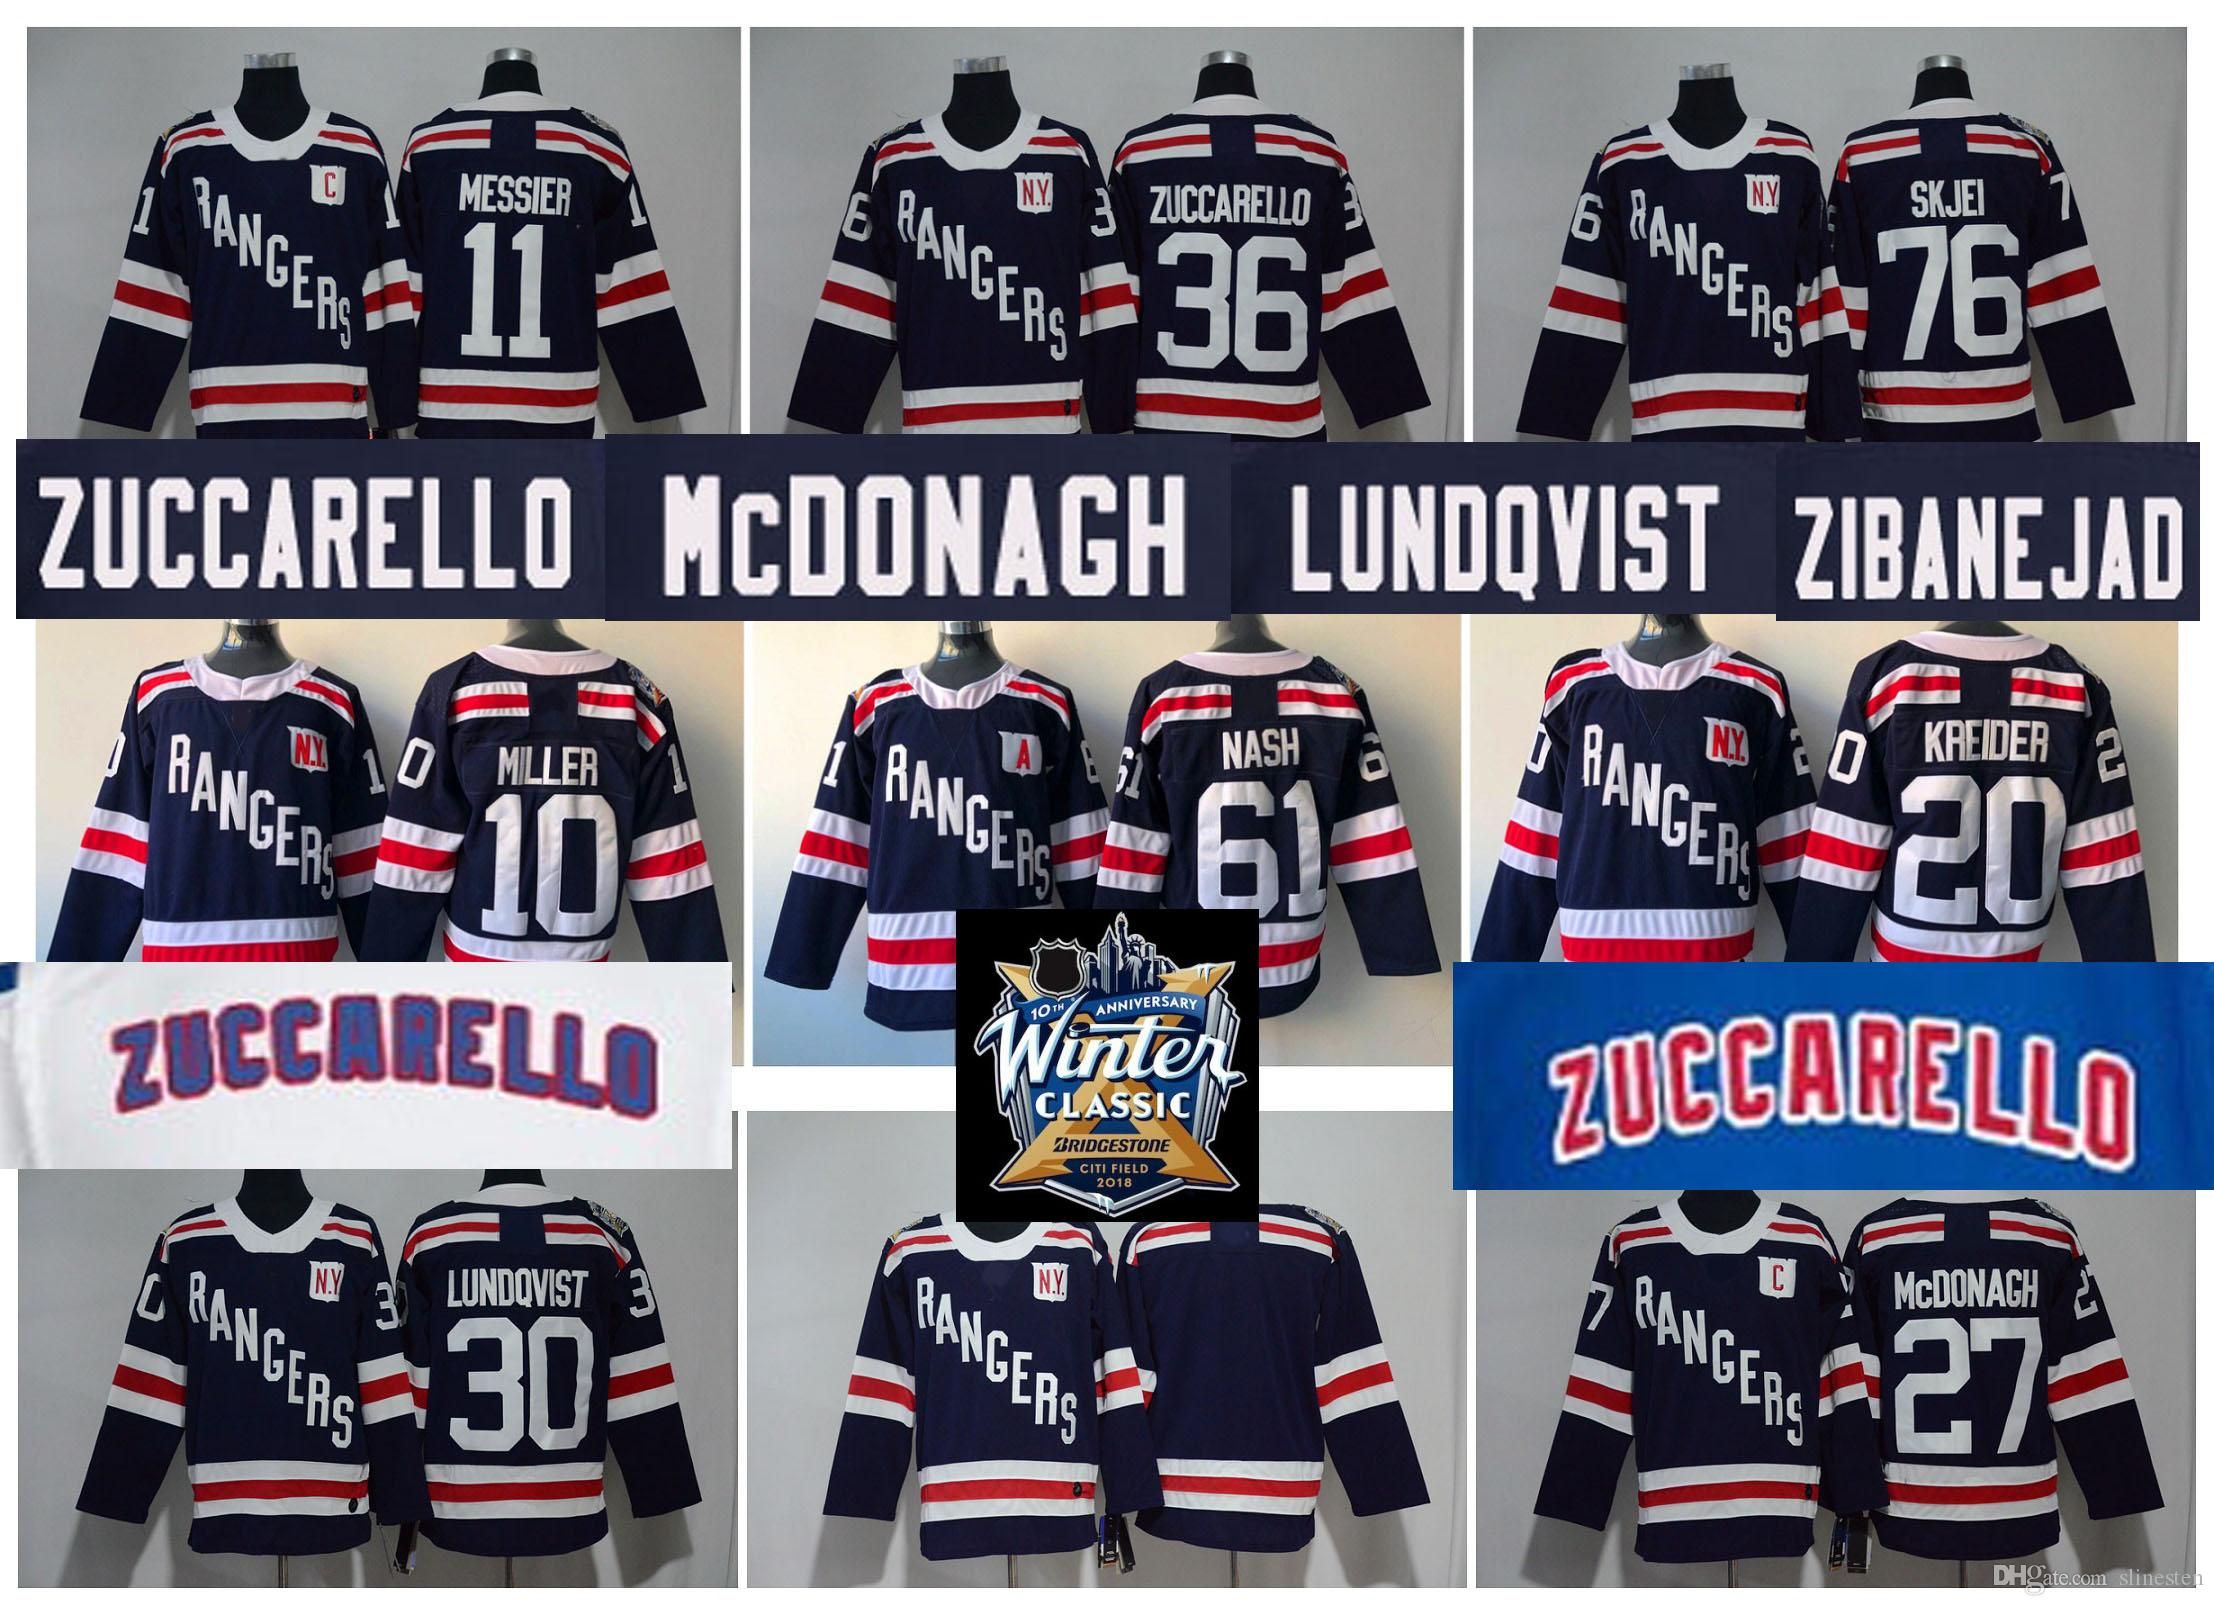 new concept 01058 db2af 2018 Winter Classic New York Rangers Jersey Hockey 36 Mats Zuccarello 27  Ryan McDonagh 30 Henrik Lundqvist Kevin Shattenkirk Brady Skjei